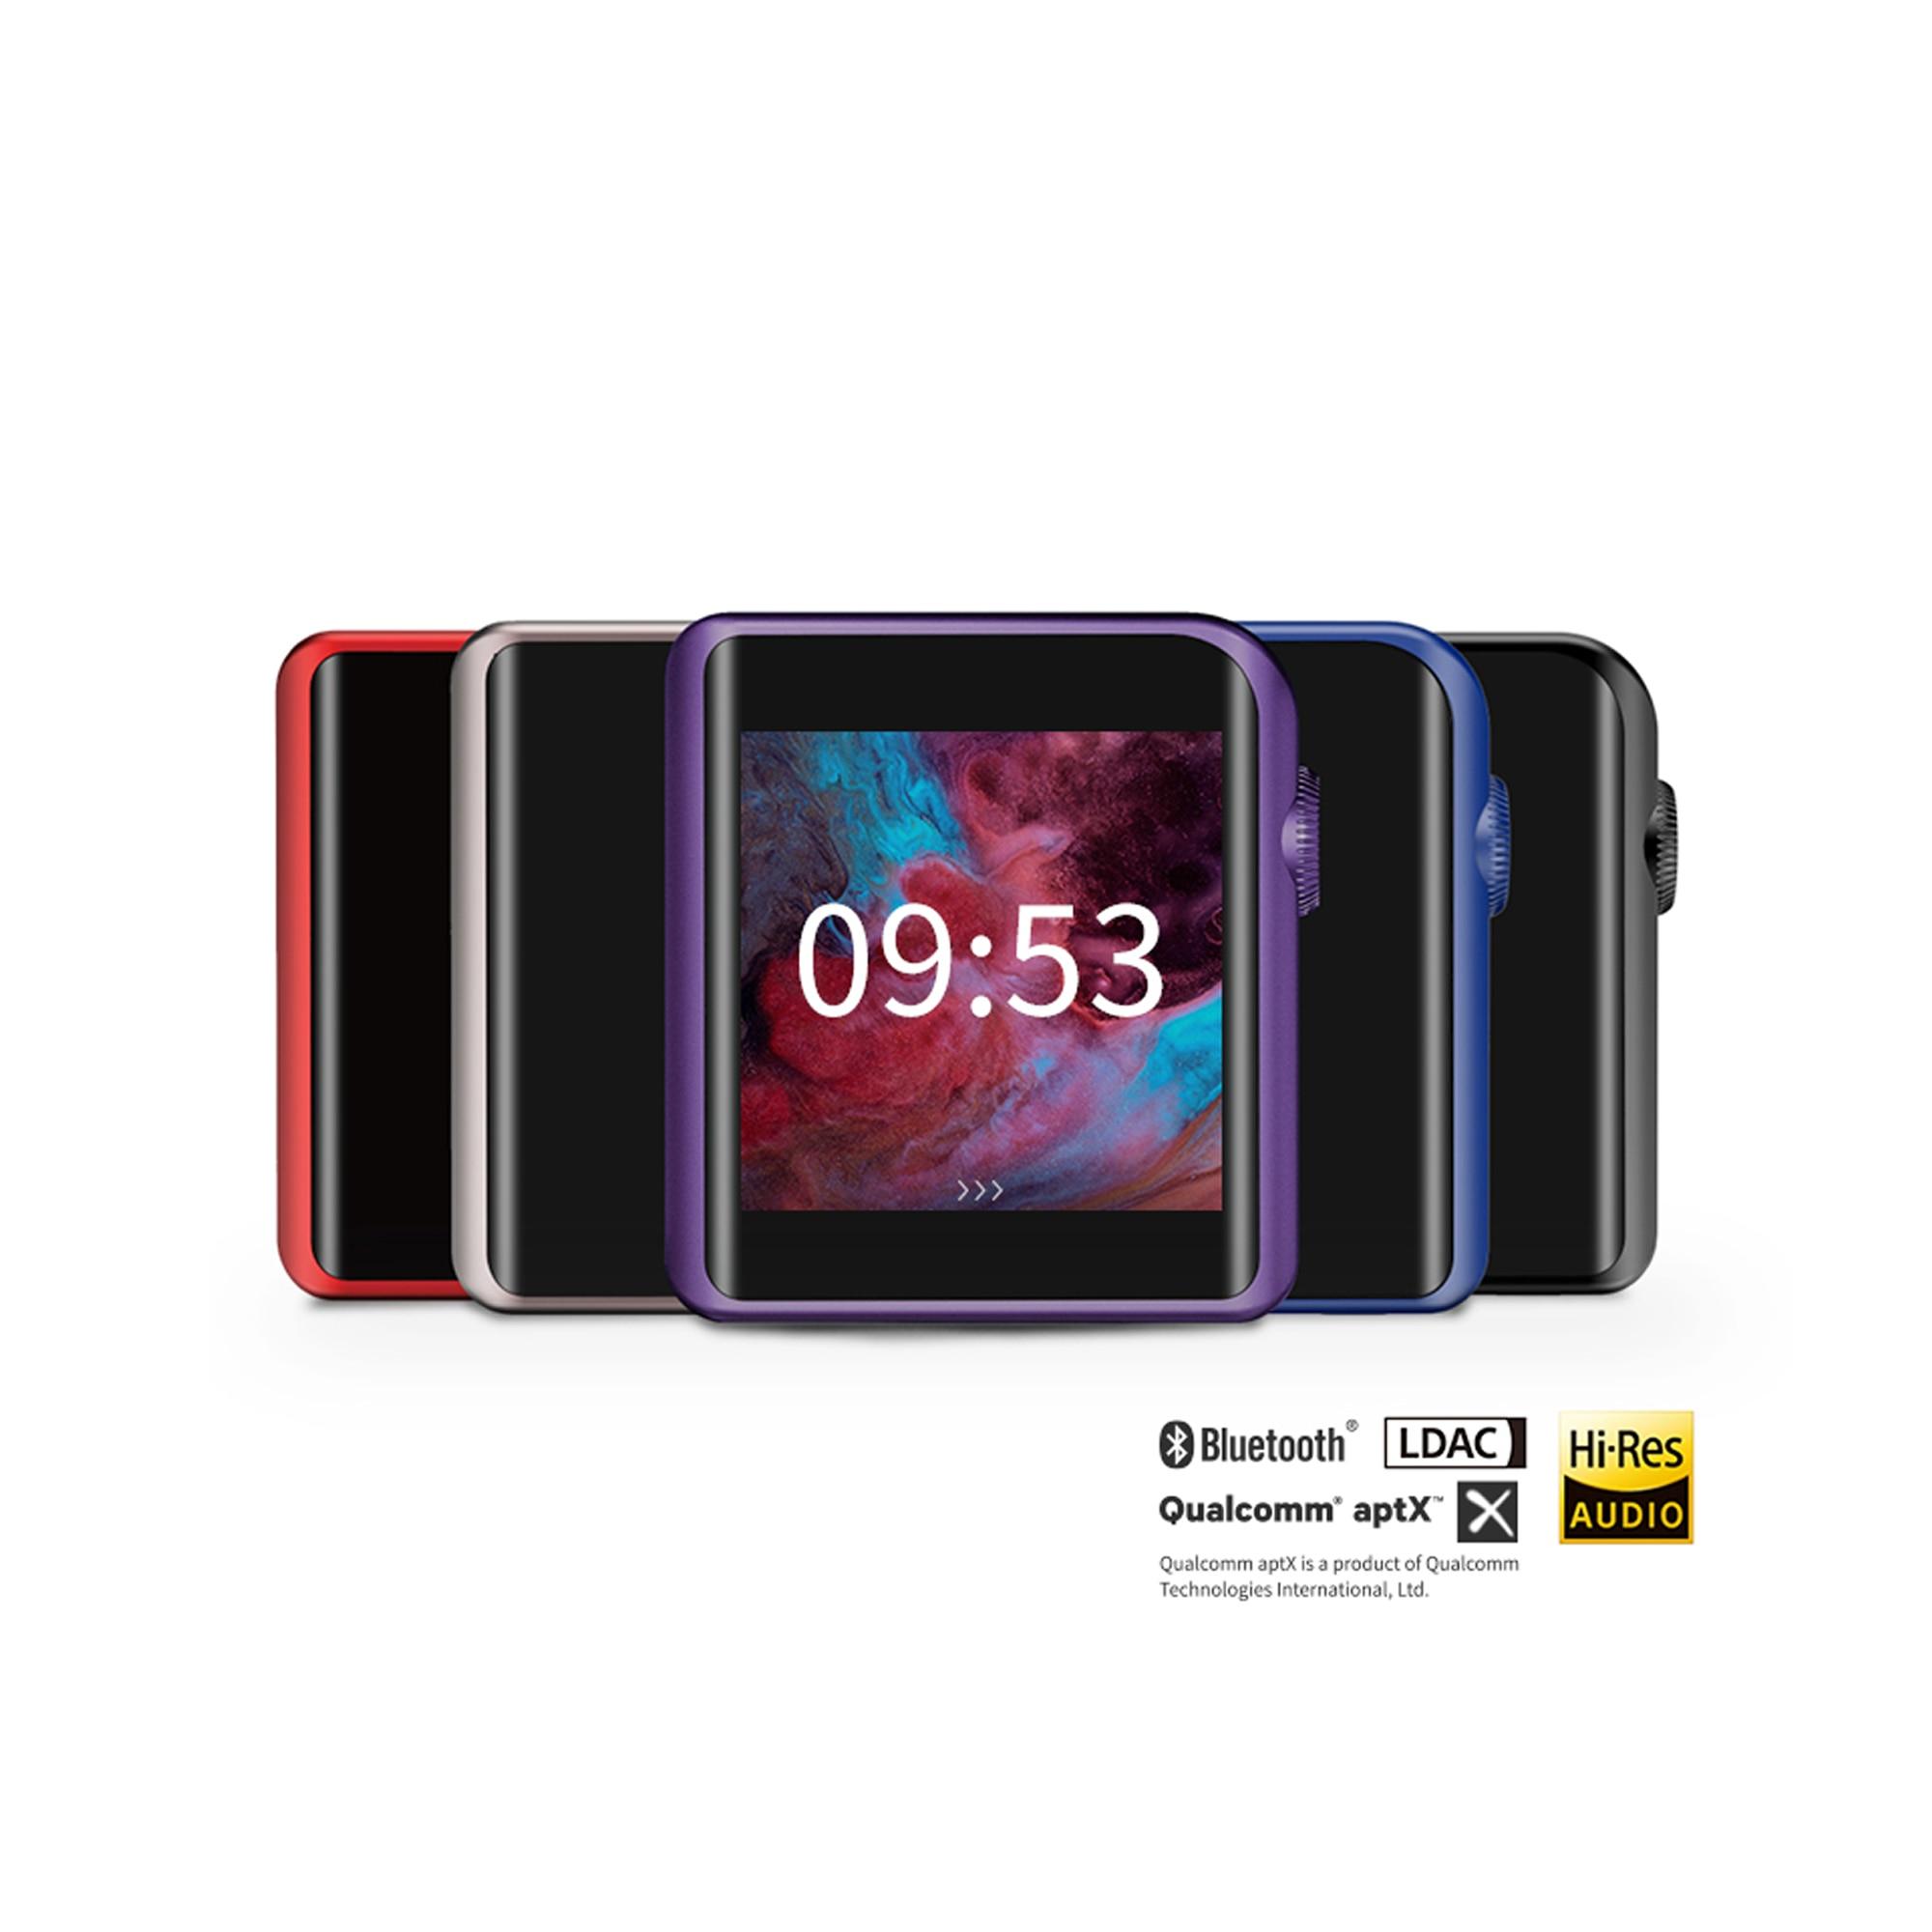 MP3 müzik çalar SHANLING M0 yüksek çözünürlüklü taşınabilir MP3 çalar kayıpsız dijital ses Bluetooth AptX HiFi LDAC DSD ES9218P